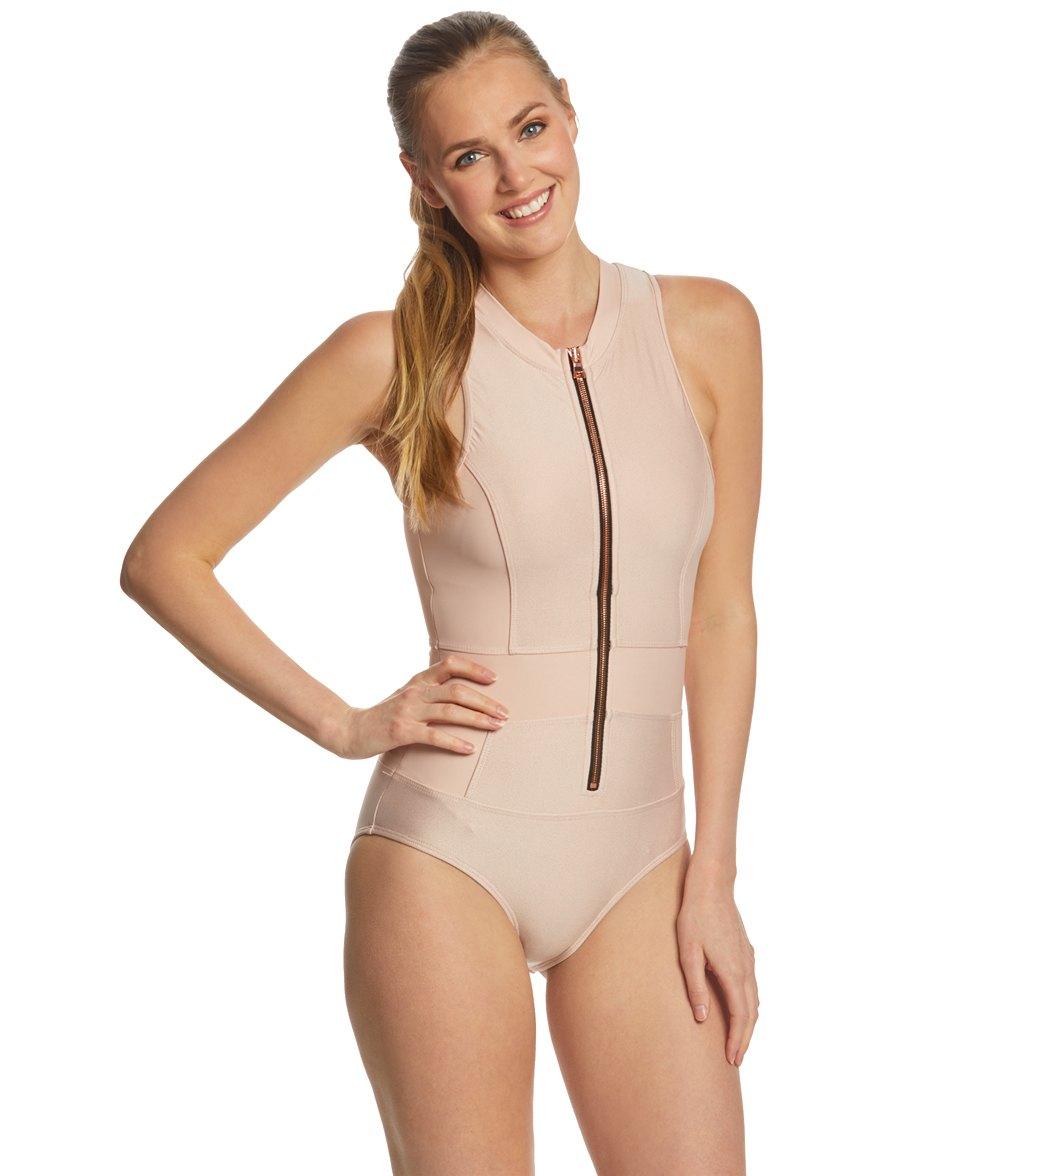 de8d2f1e0f501 Next Feeling Fine Malibu Tank One Piece Swimsuit at SwimOutlet.com - Free  Shipping